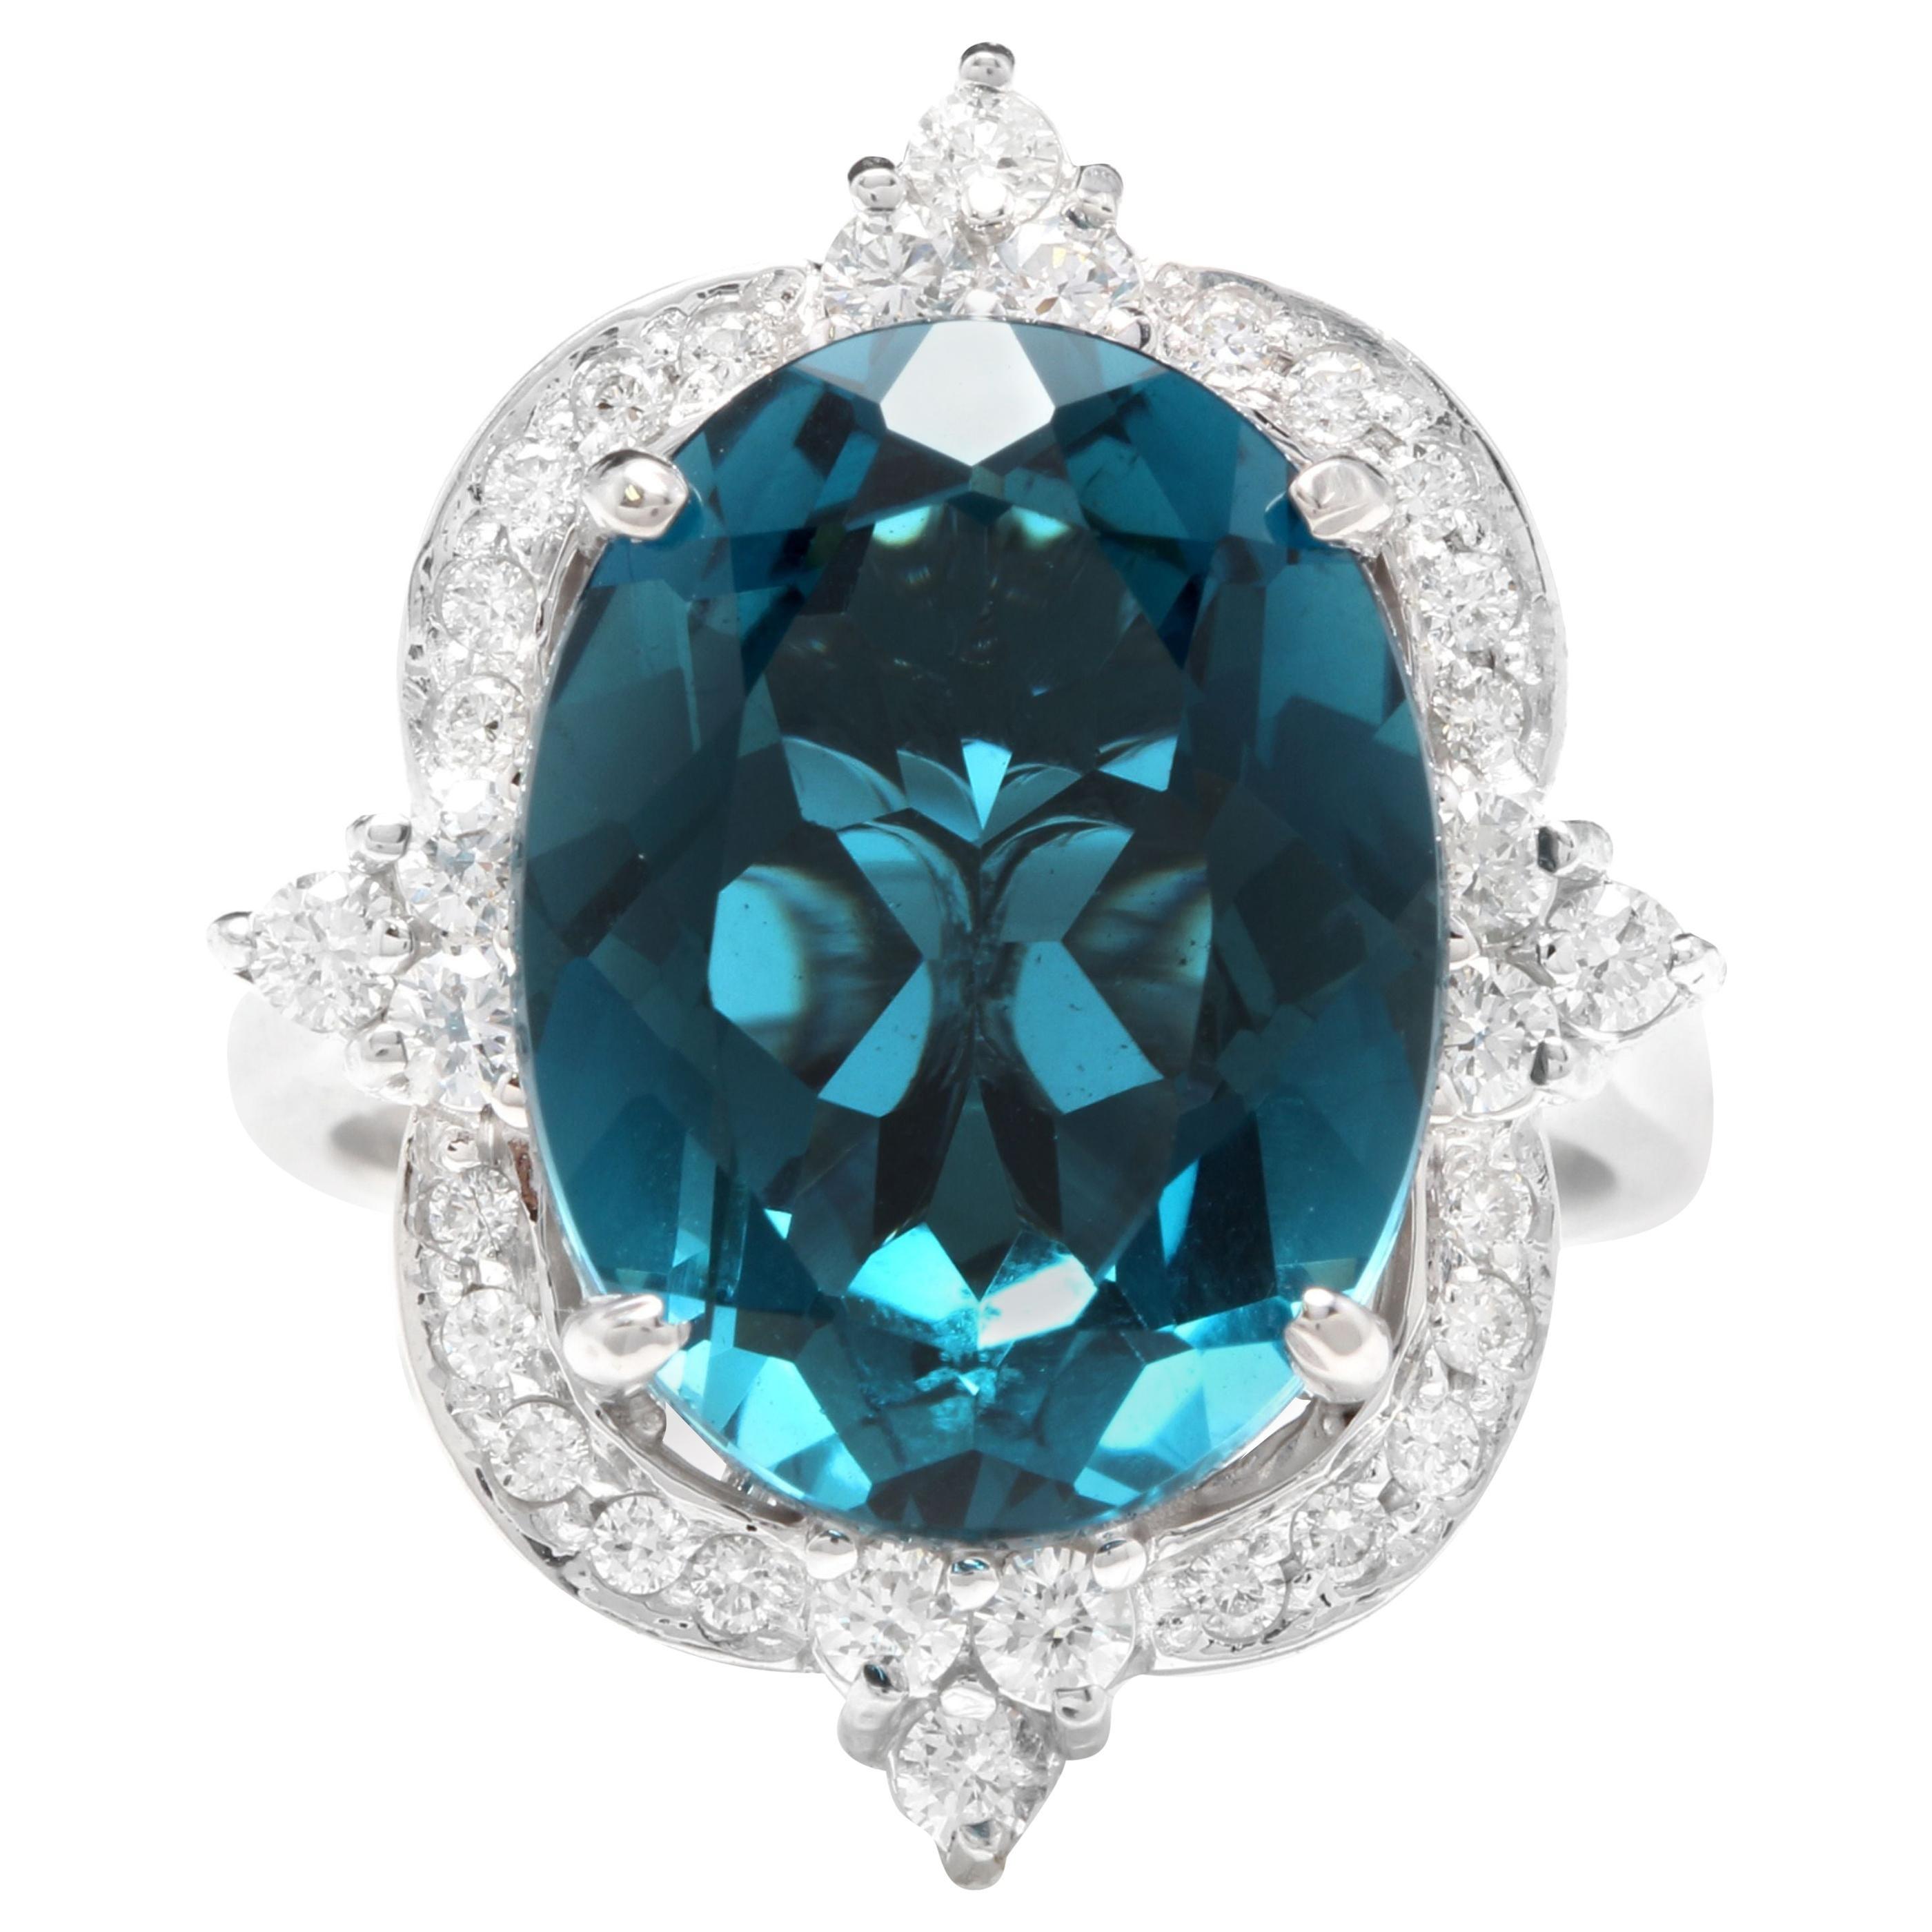 12.75 Carat Natural Impressive London Blue Topaz and Diamond 14K White Gold Ring